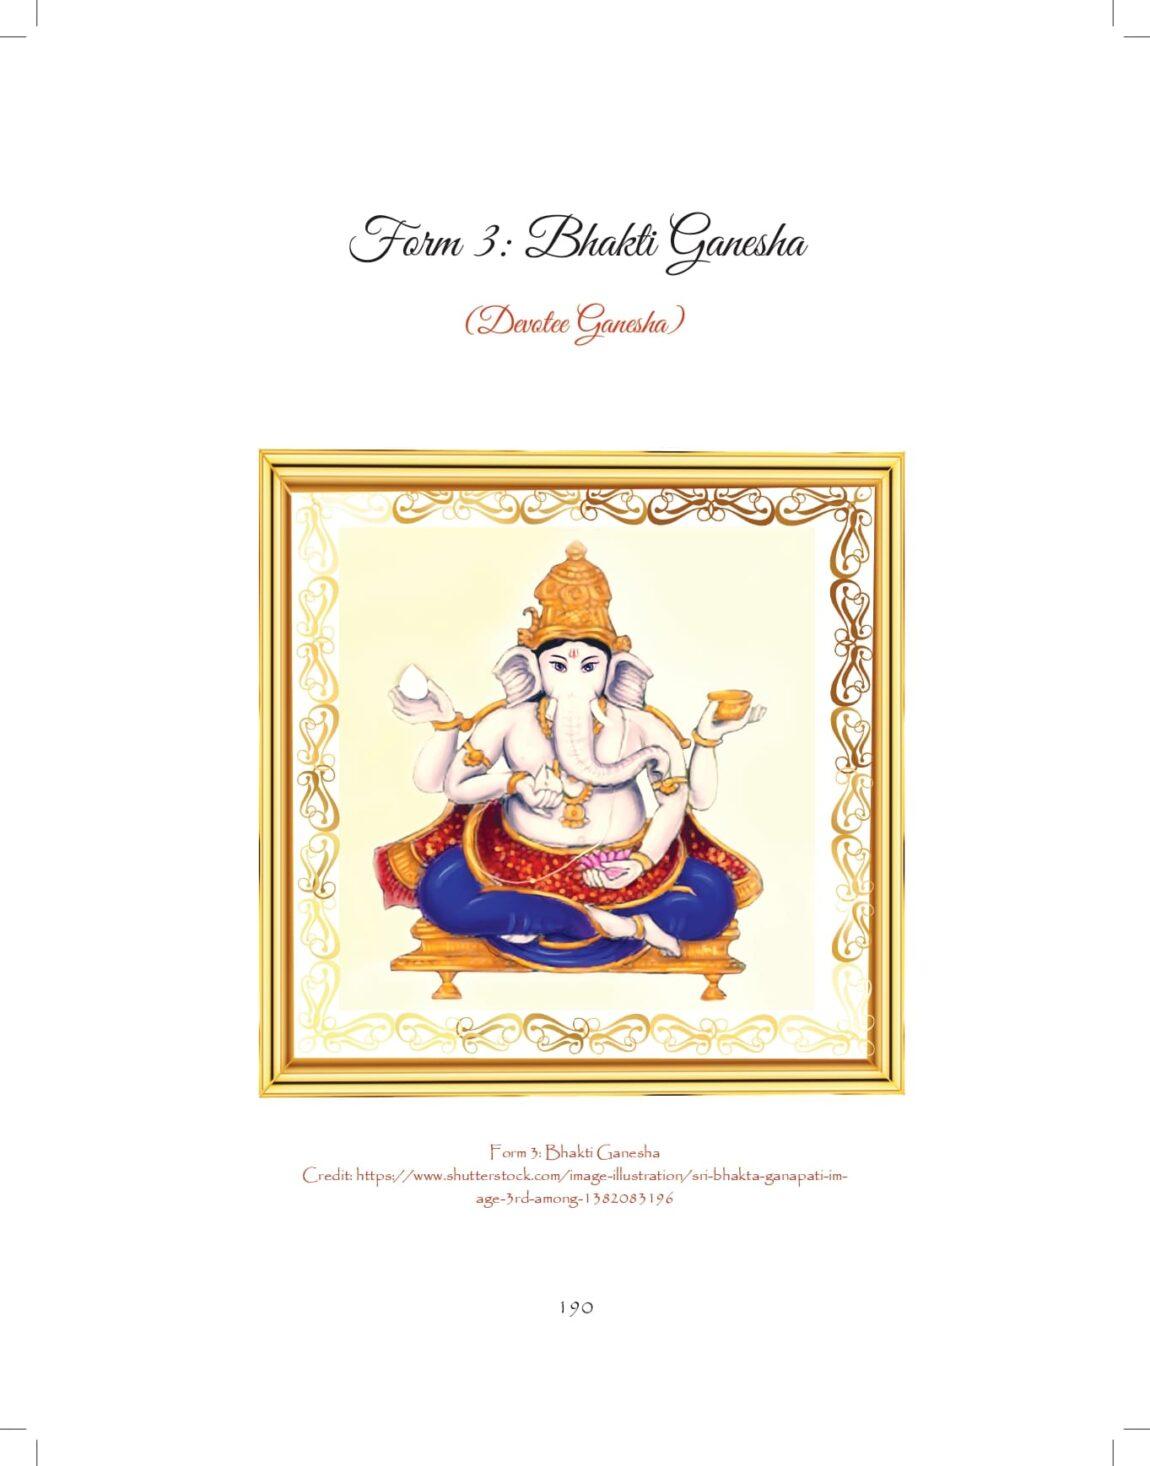 Ganesh-print_pages-to-jpg-0190.jpg